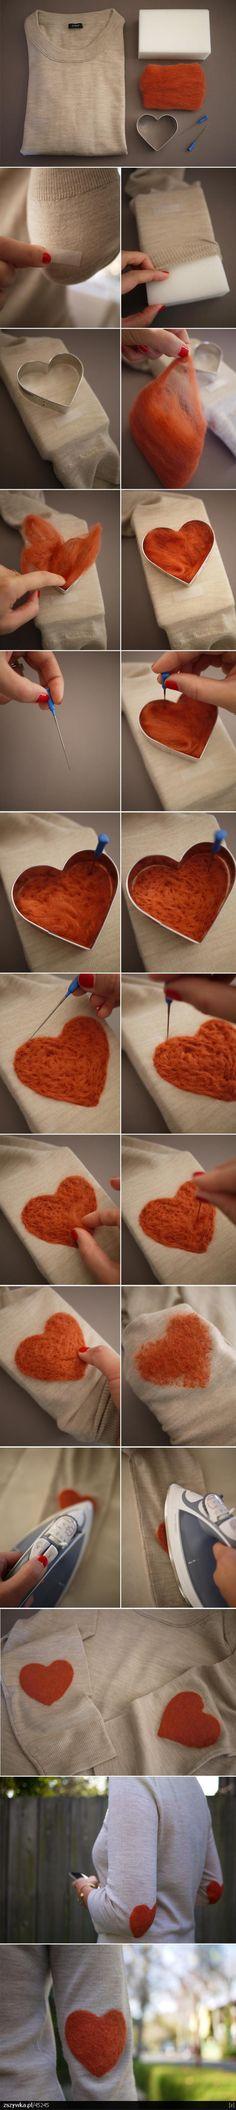 heart shaped